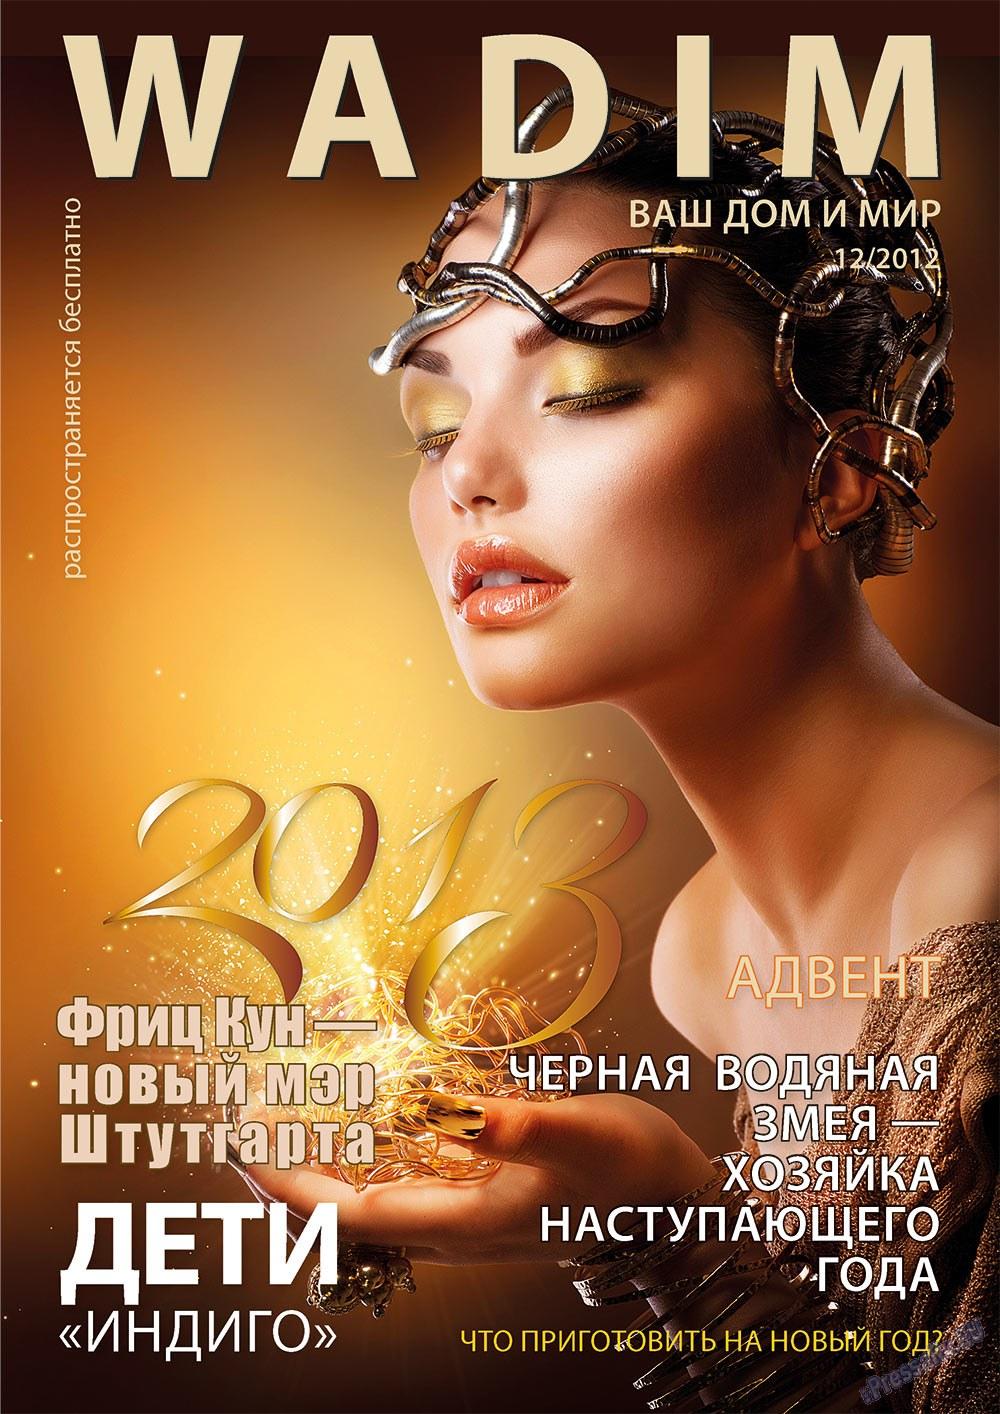 Wadim (журнал). 2012 год, номер 12, стр. 1